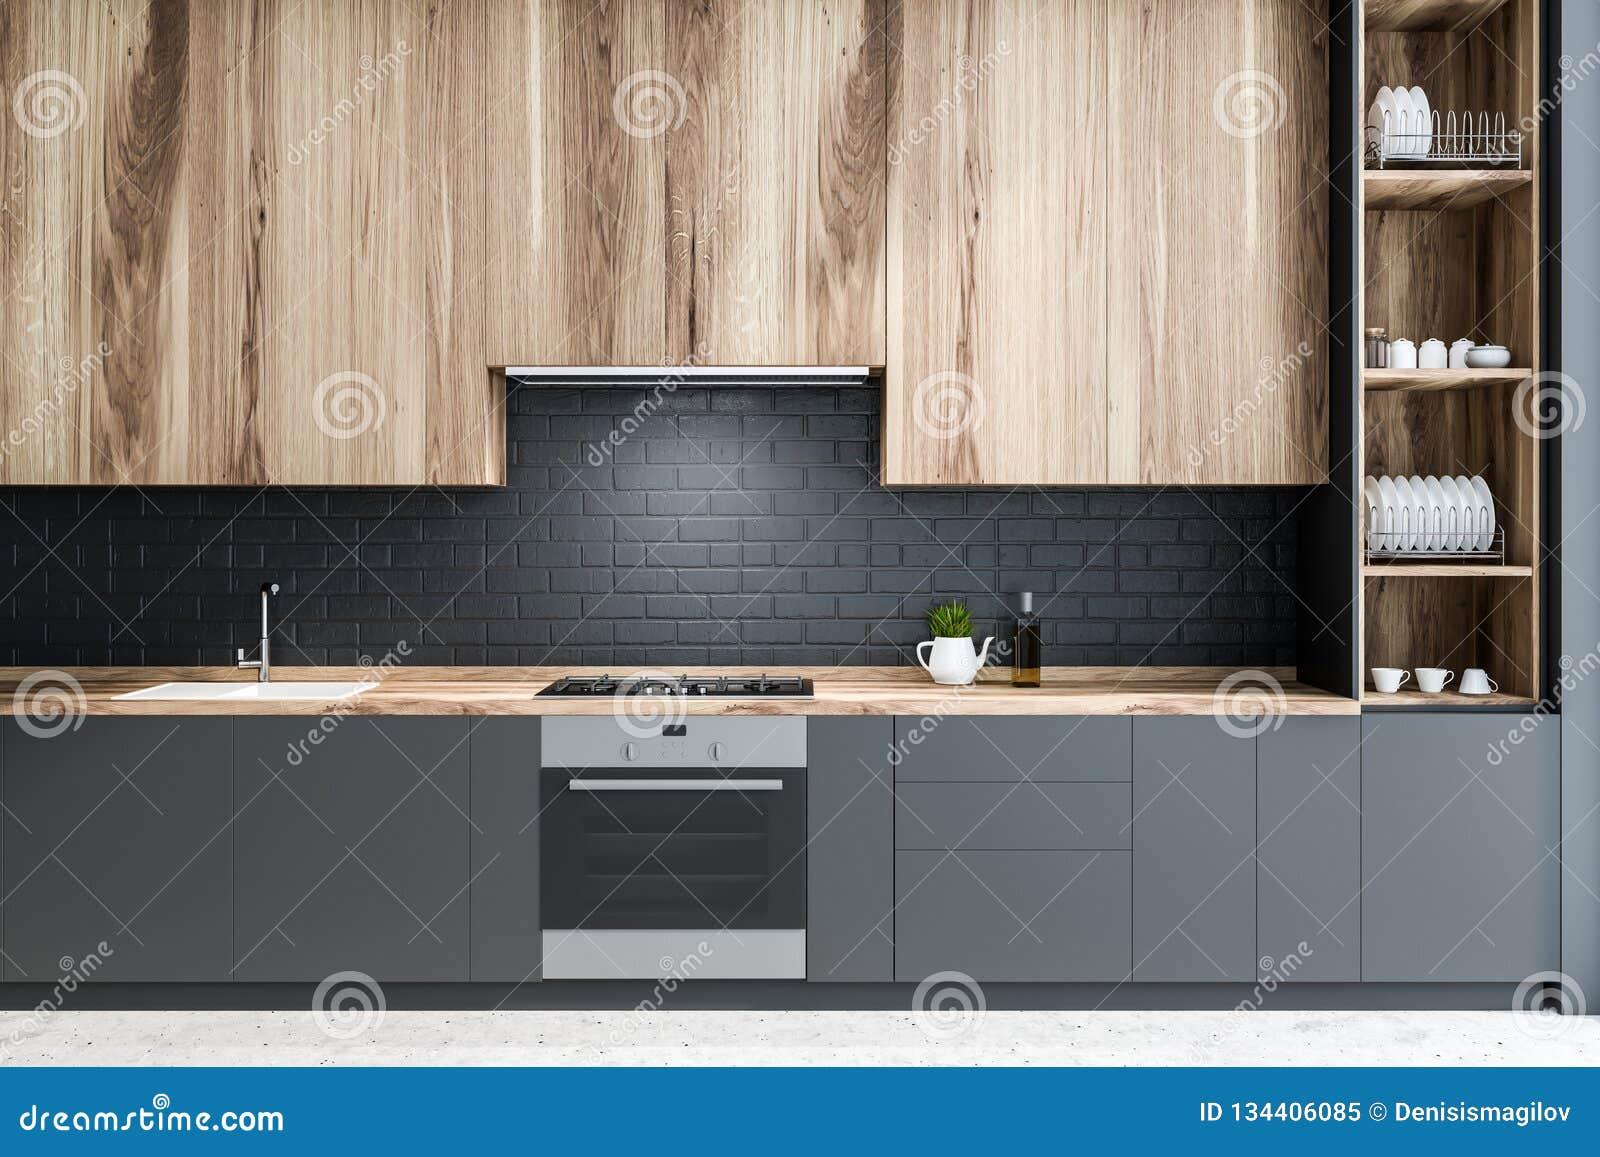 Black Brick Kitchen Wooden Countertops Stock Illustration Illustration Of Cabinet Bright 134406085